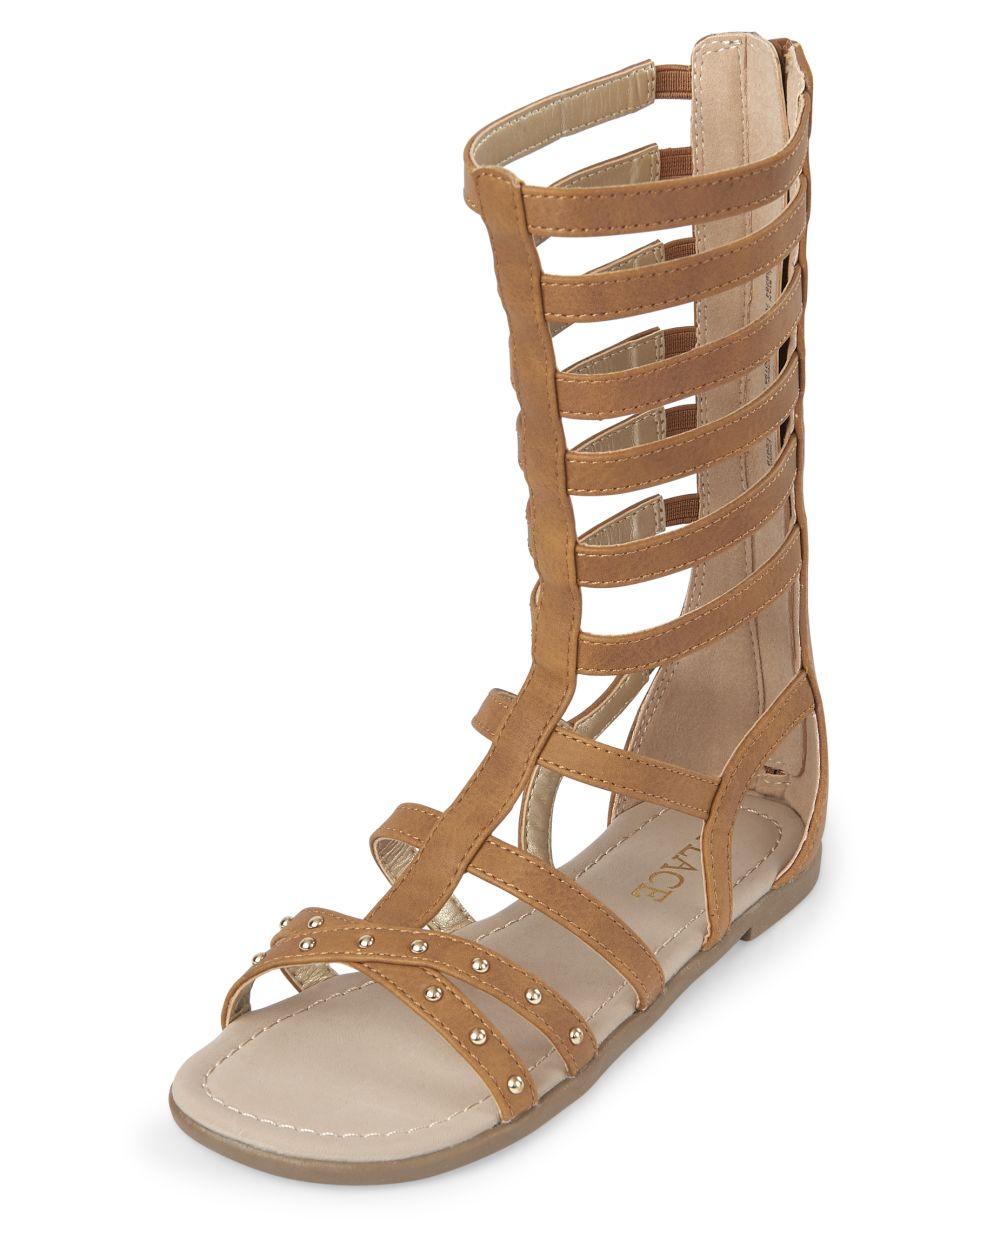 Girls Studded Tall Gladiator Sandals